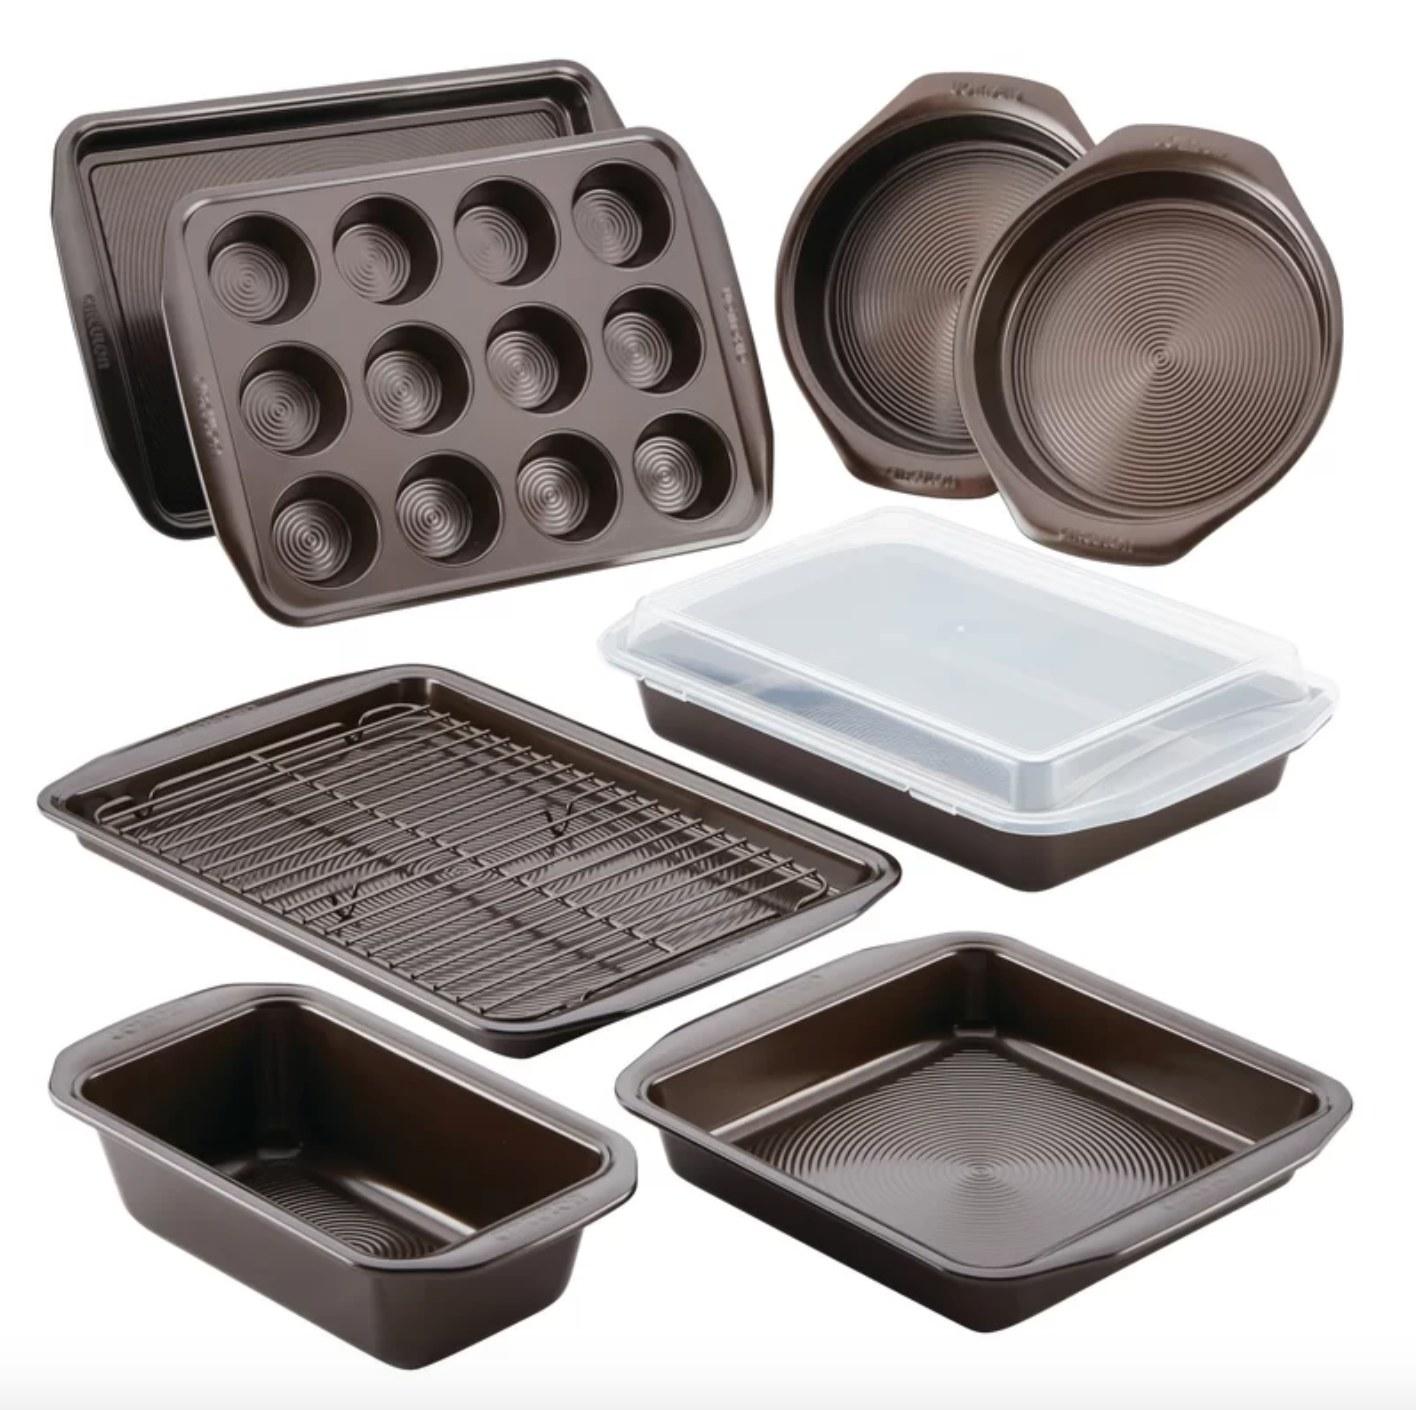 The bakeware set